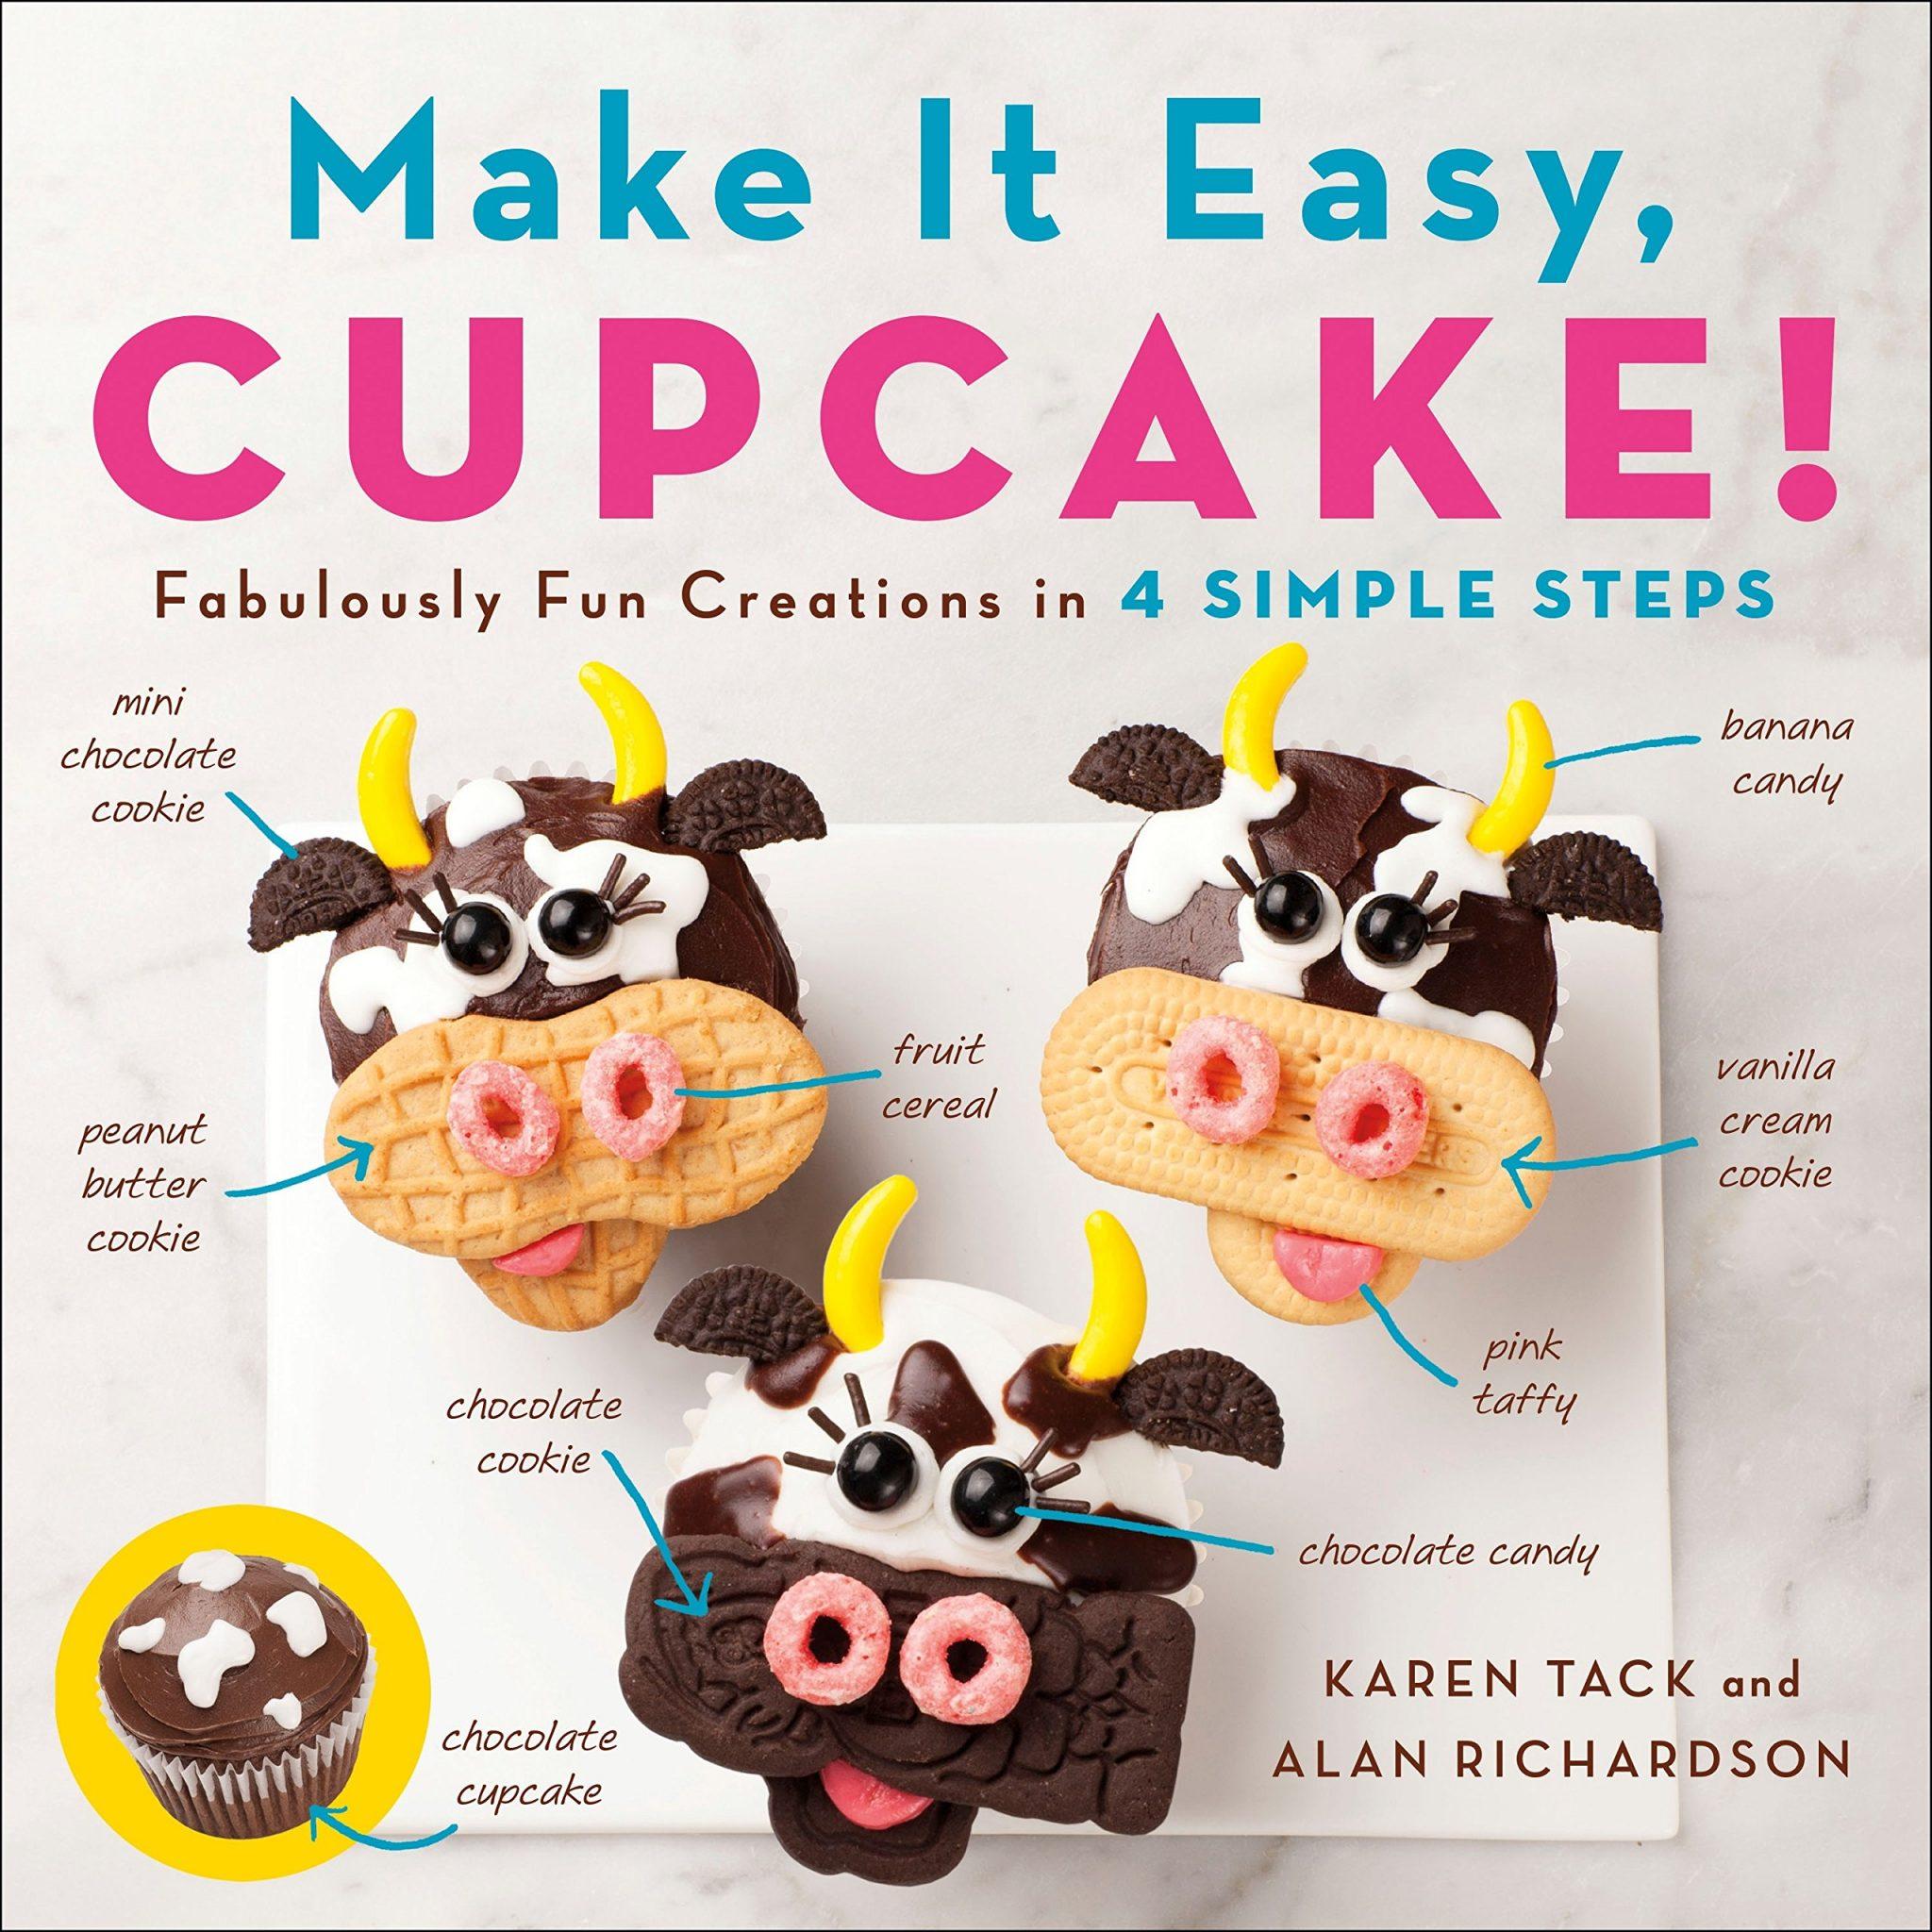 Make it Easy, Cupcake